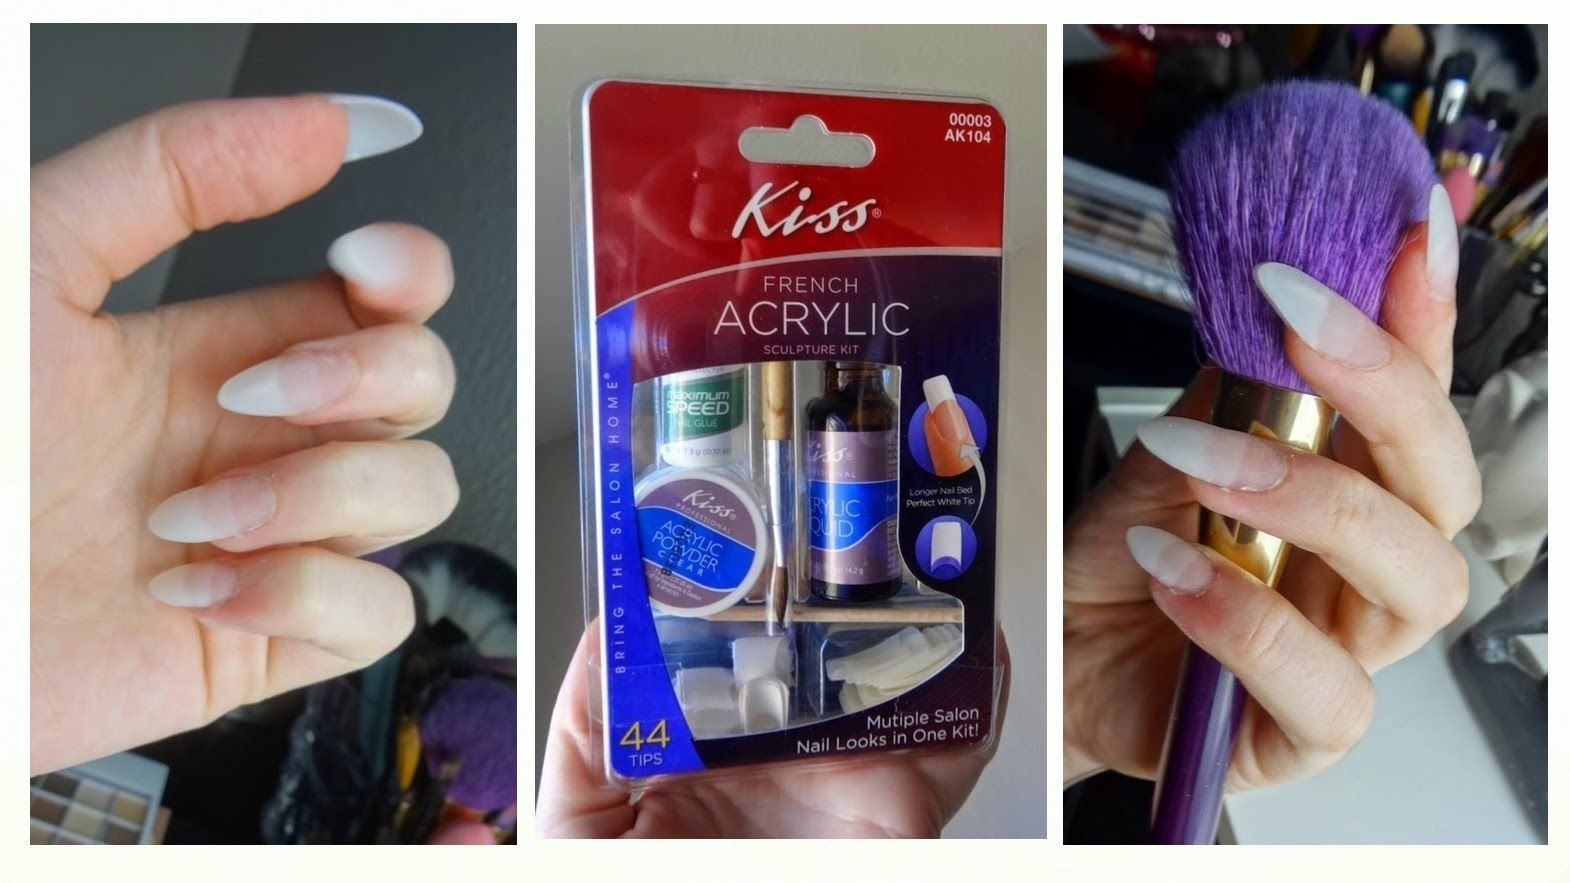 Kiss Acrylic Nail Kit Demo Tutorial Acrylic Nails At Home Diy Acrylic Nails Diy Acrylic Nails Kit